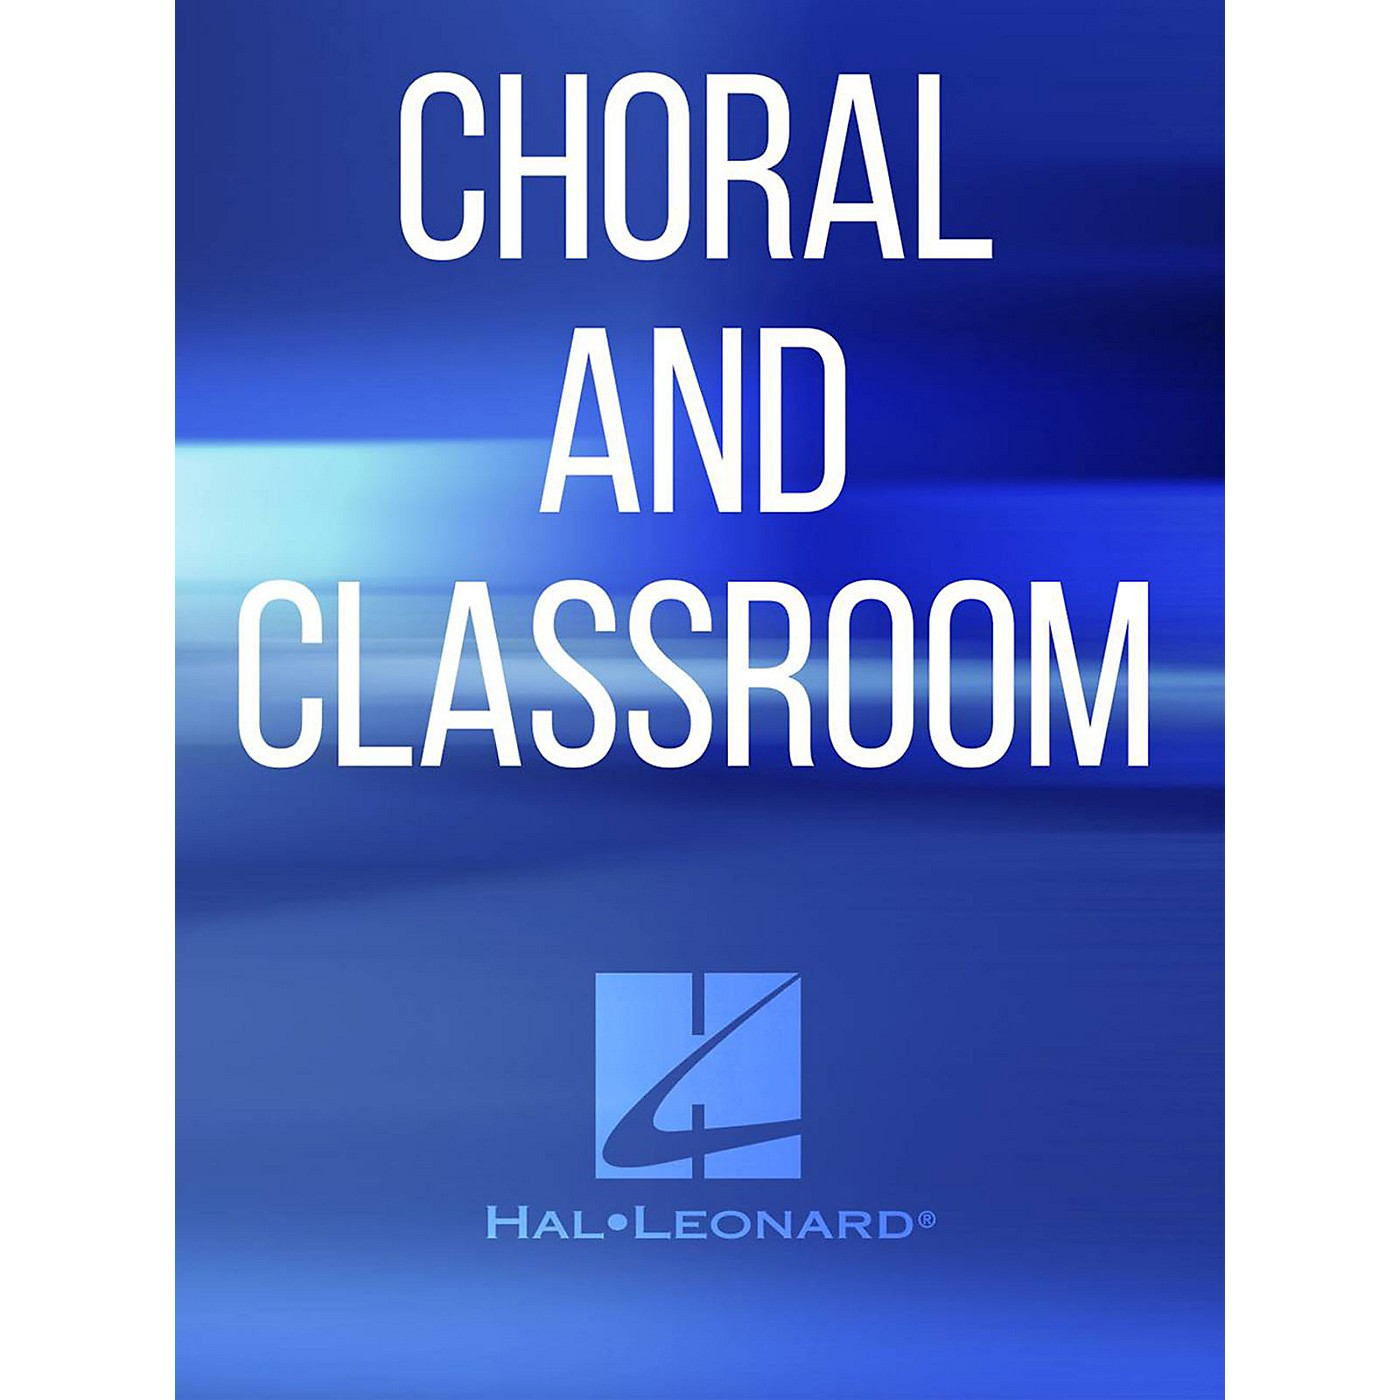 Hal Leonard Sallu Aynama Kuntum Composed by Joanna Nachef thumbnail